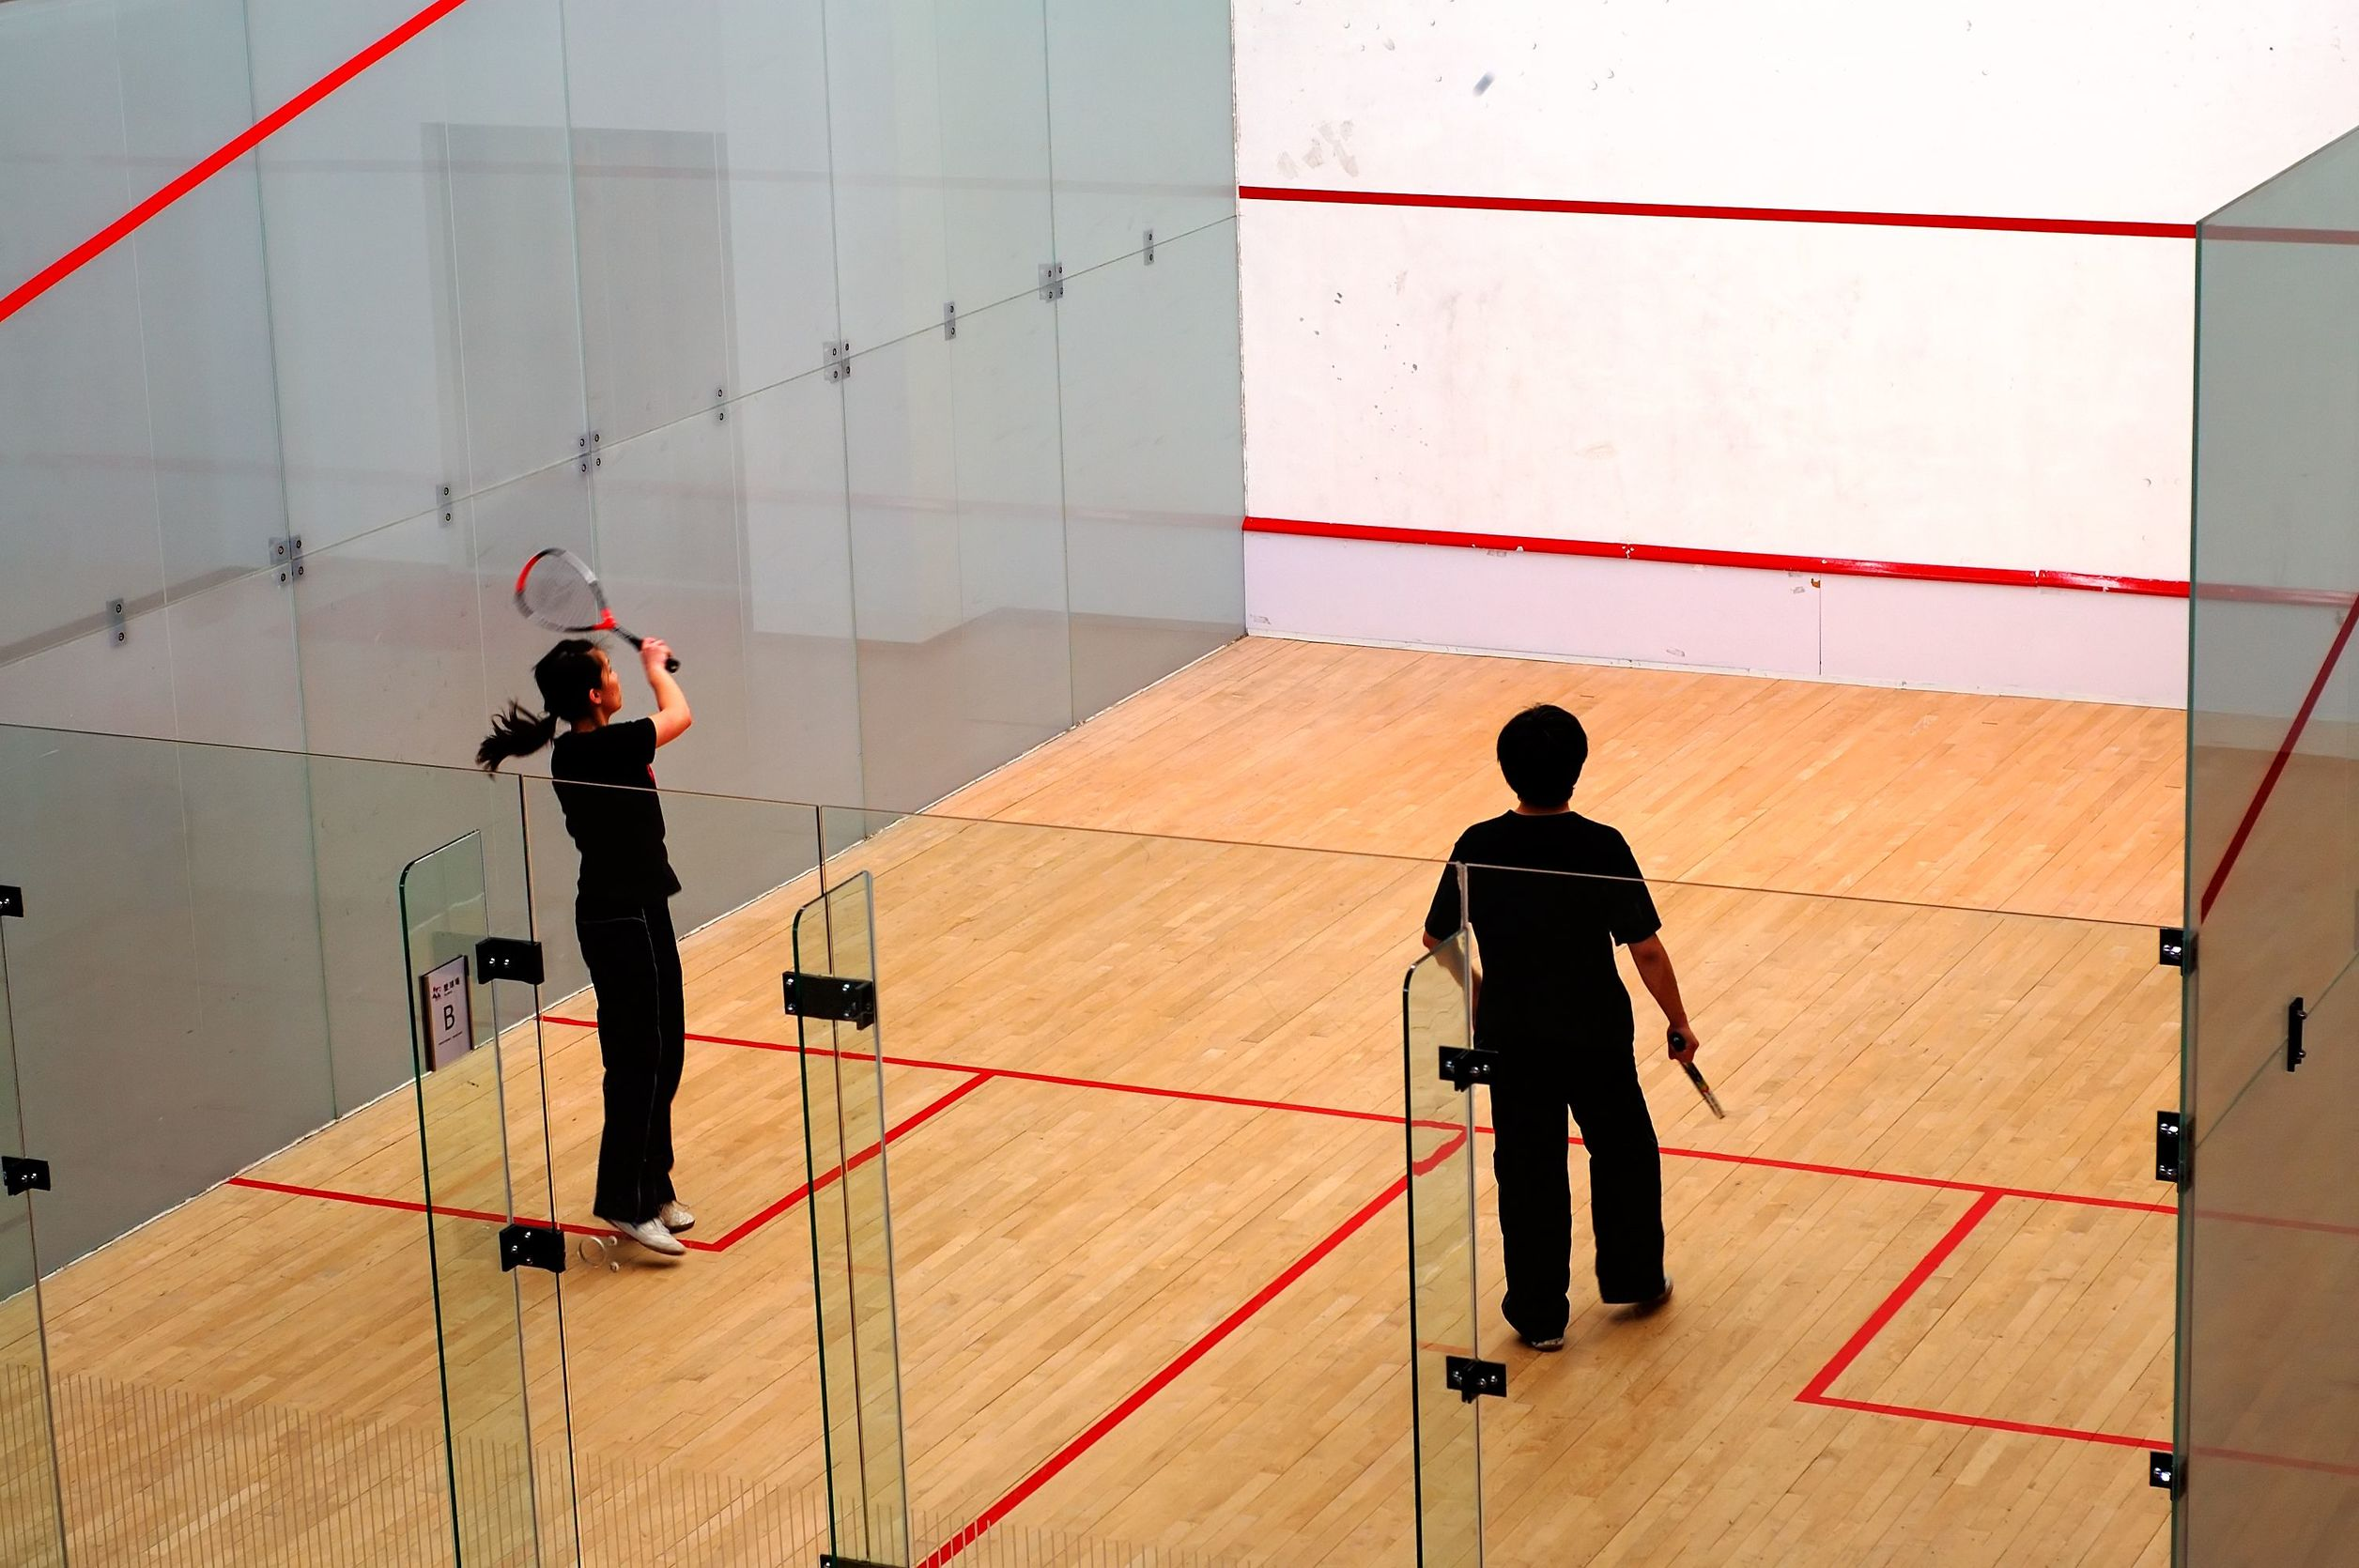 jugando squash